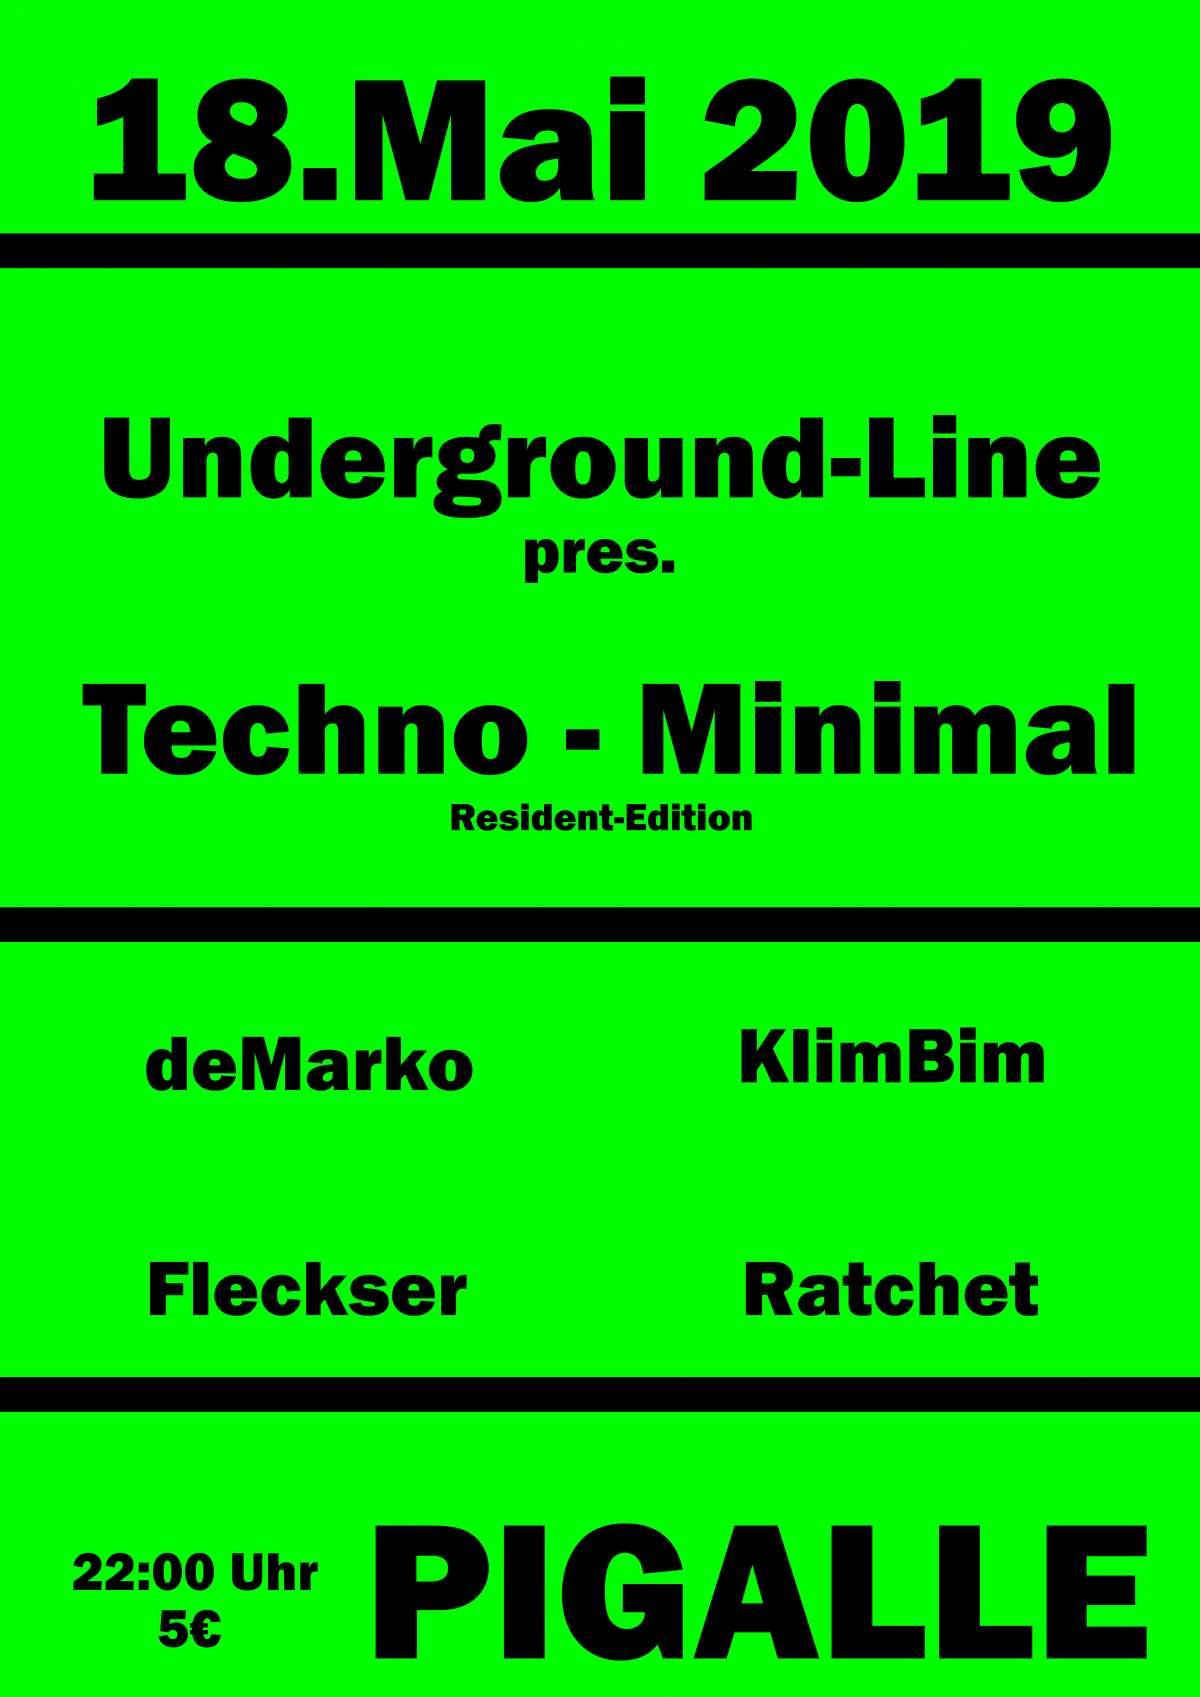 Underground-Line pres. Techno / Minimal - Fleckser,deMarko,Ratchet,KlimBim - Pigalle - Bad Arolsen-Mengeringhausen